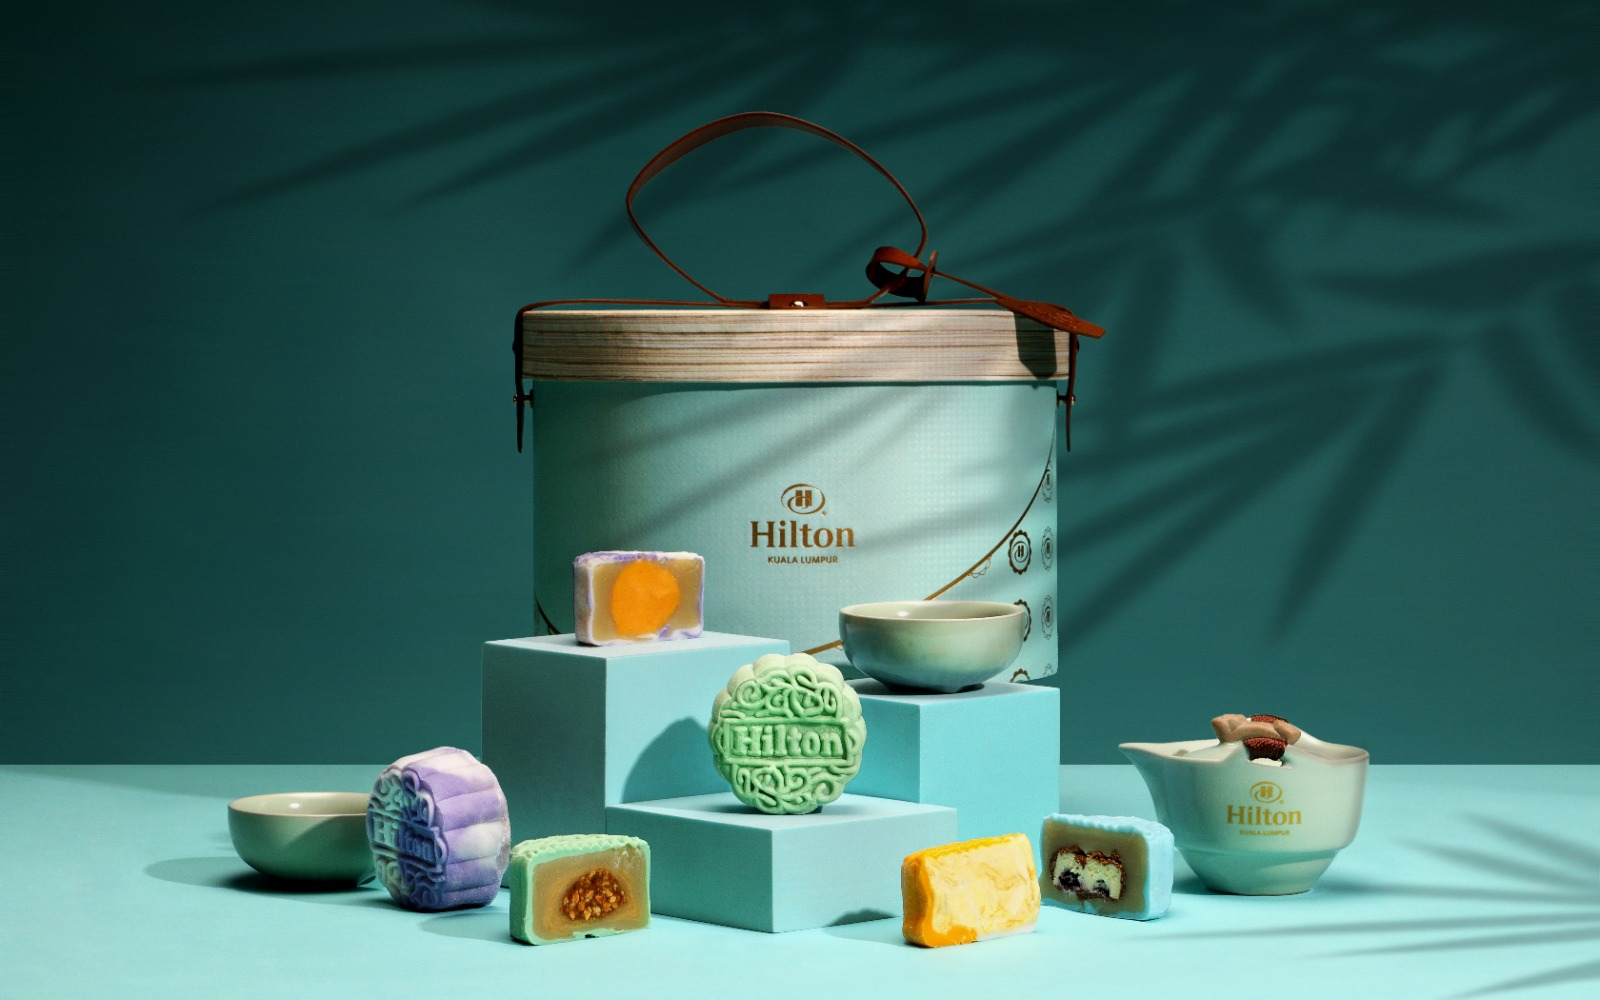 hilton kl hotel mooncake 2021 2 - 12款最适合商务送礼的高级月饼礼盒